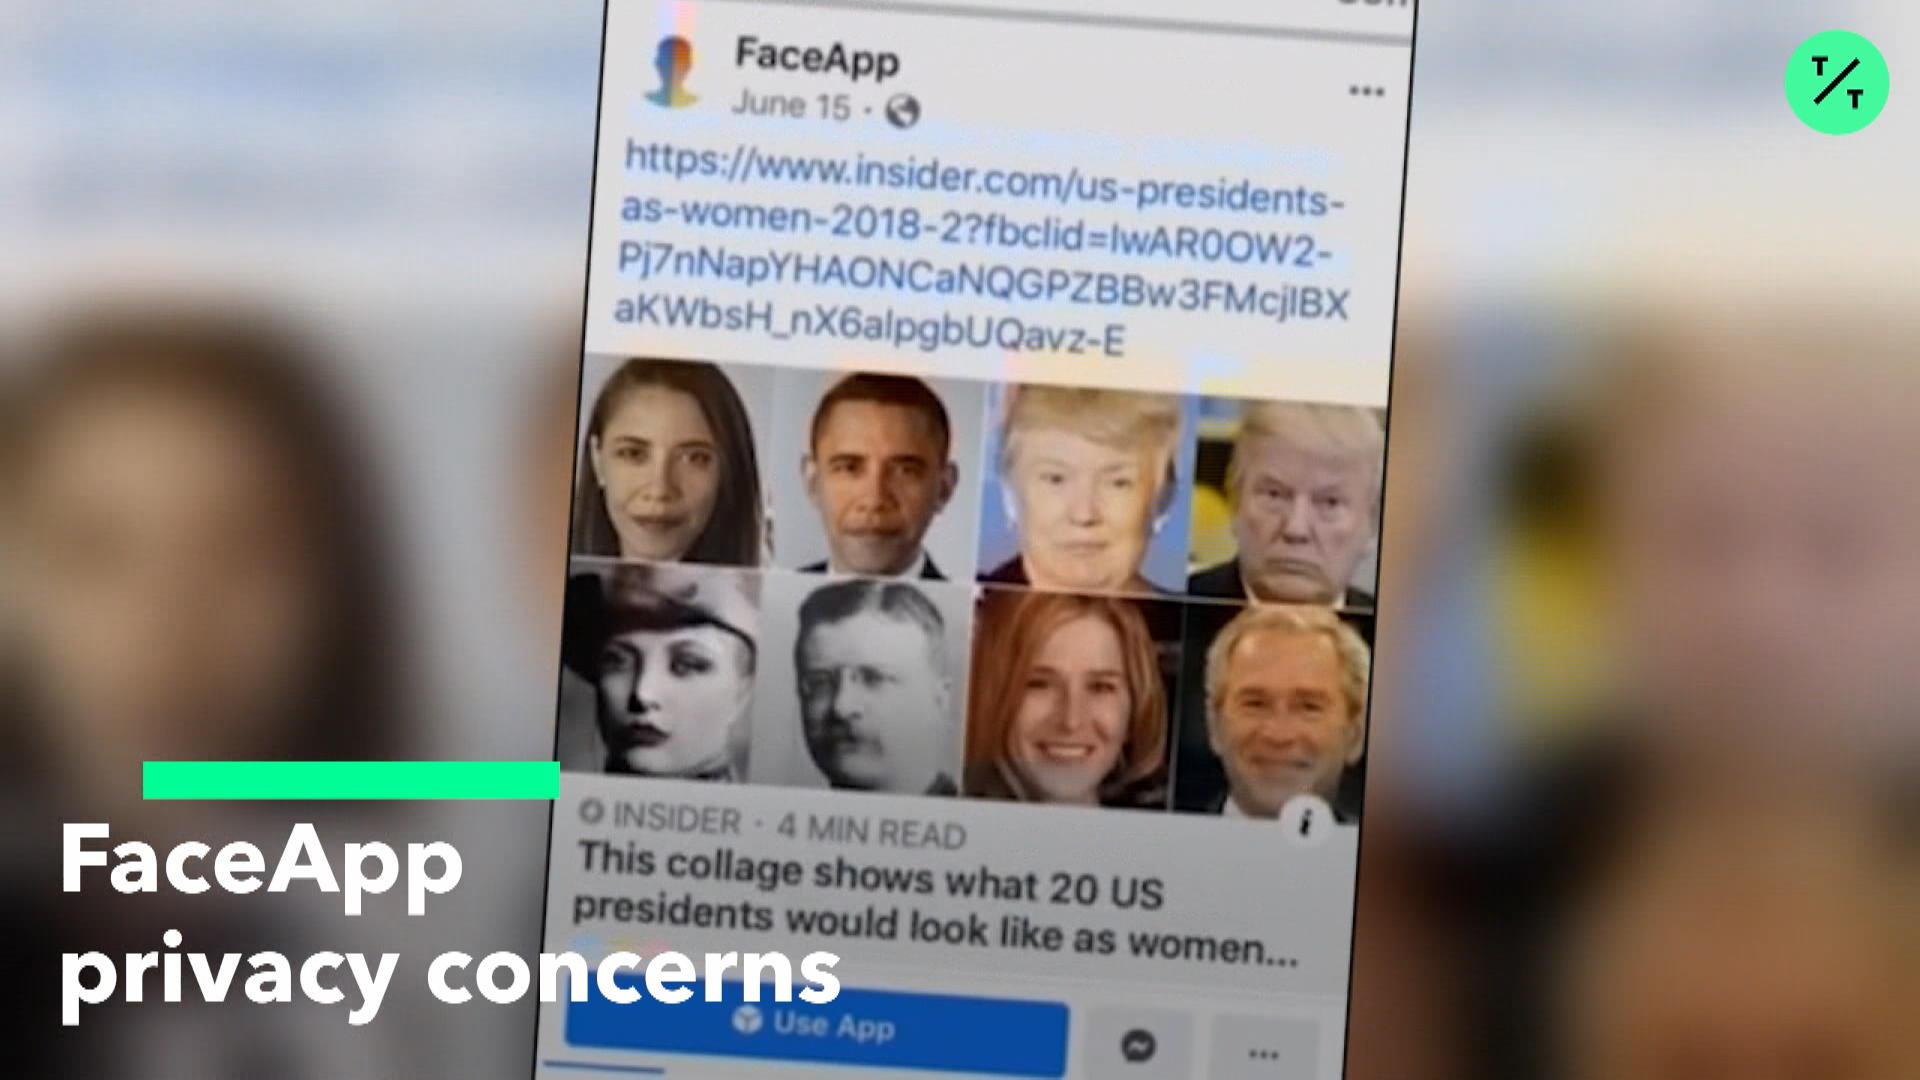 FaceApp Privacy Concerns